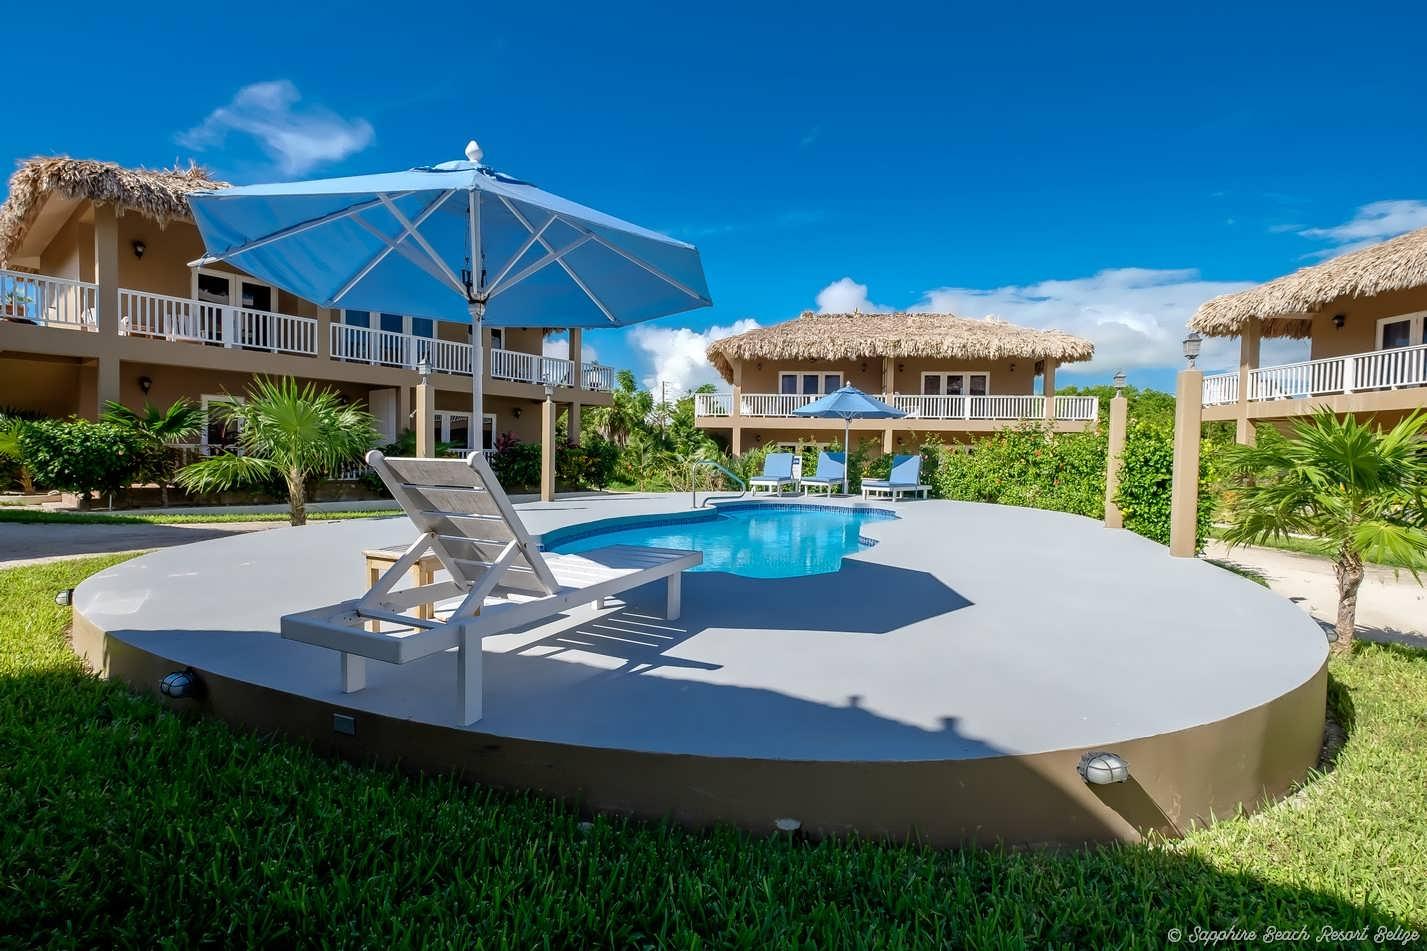 Sapphire Beach Resort Pools 21.jpg